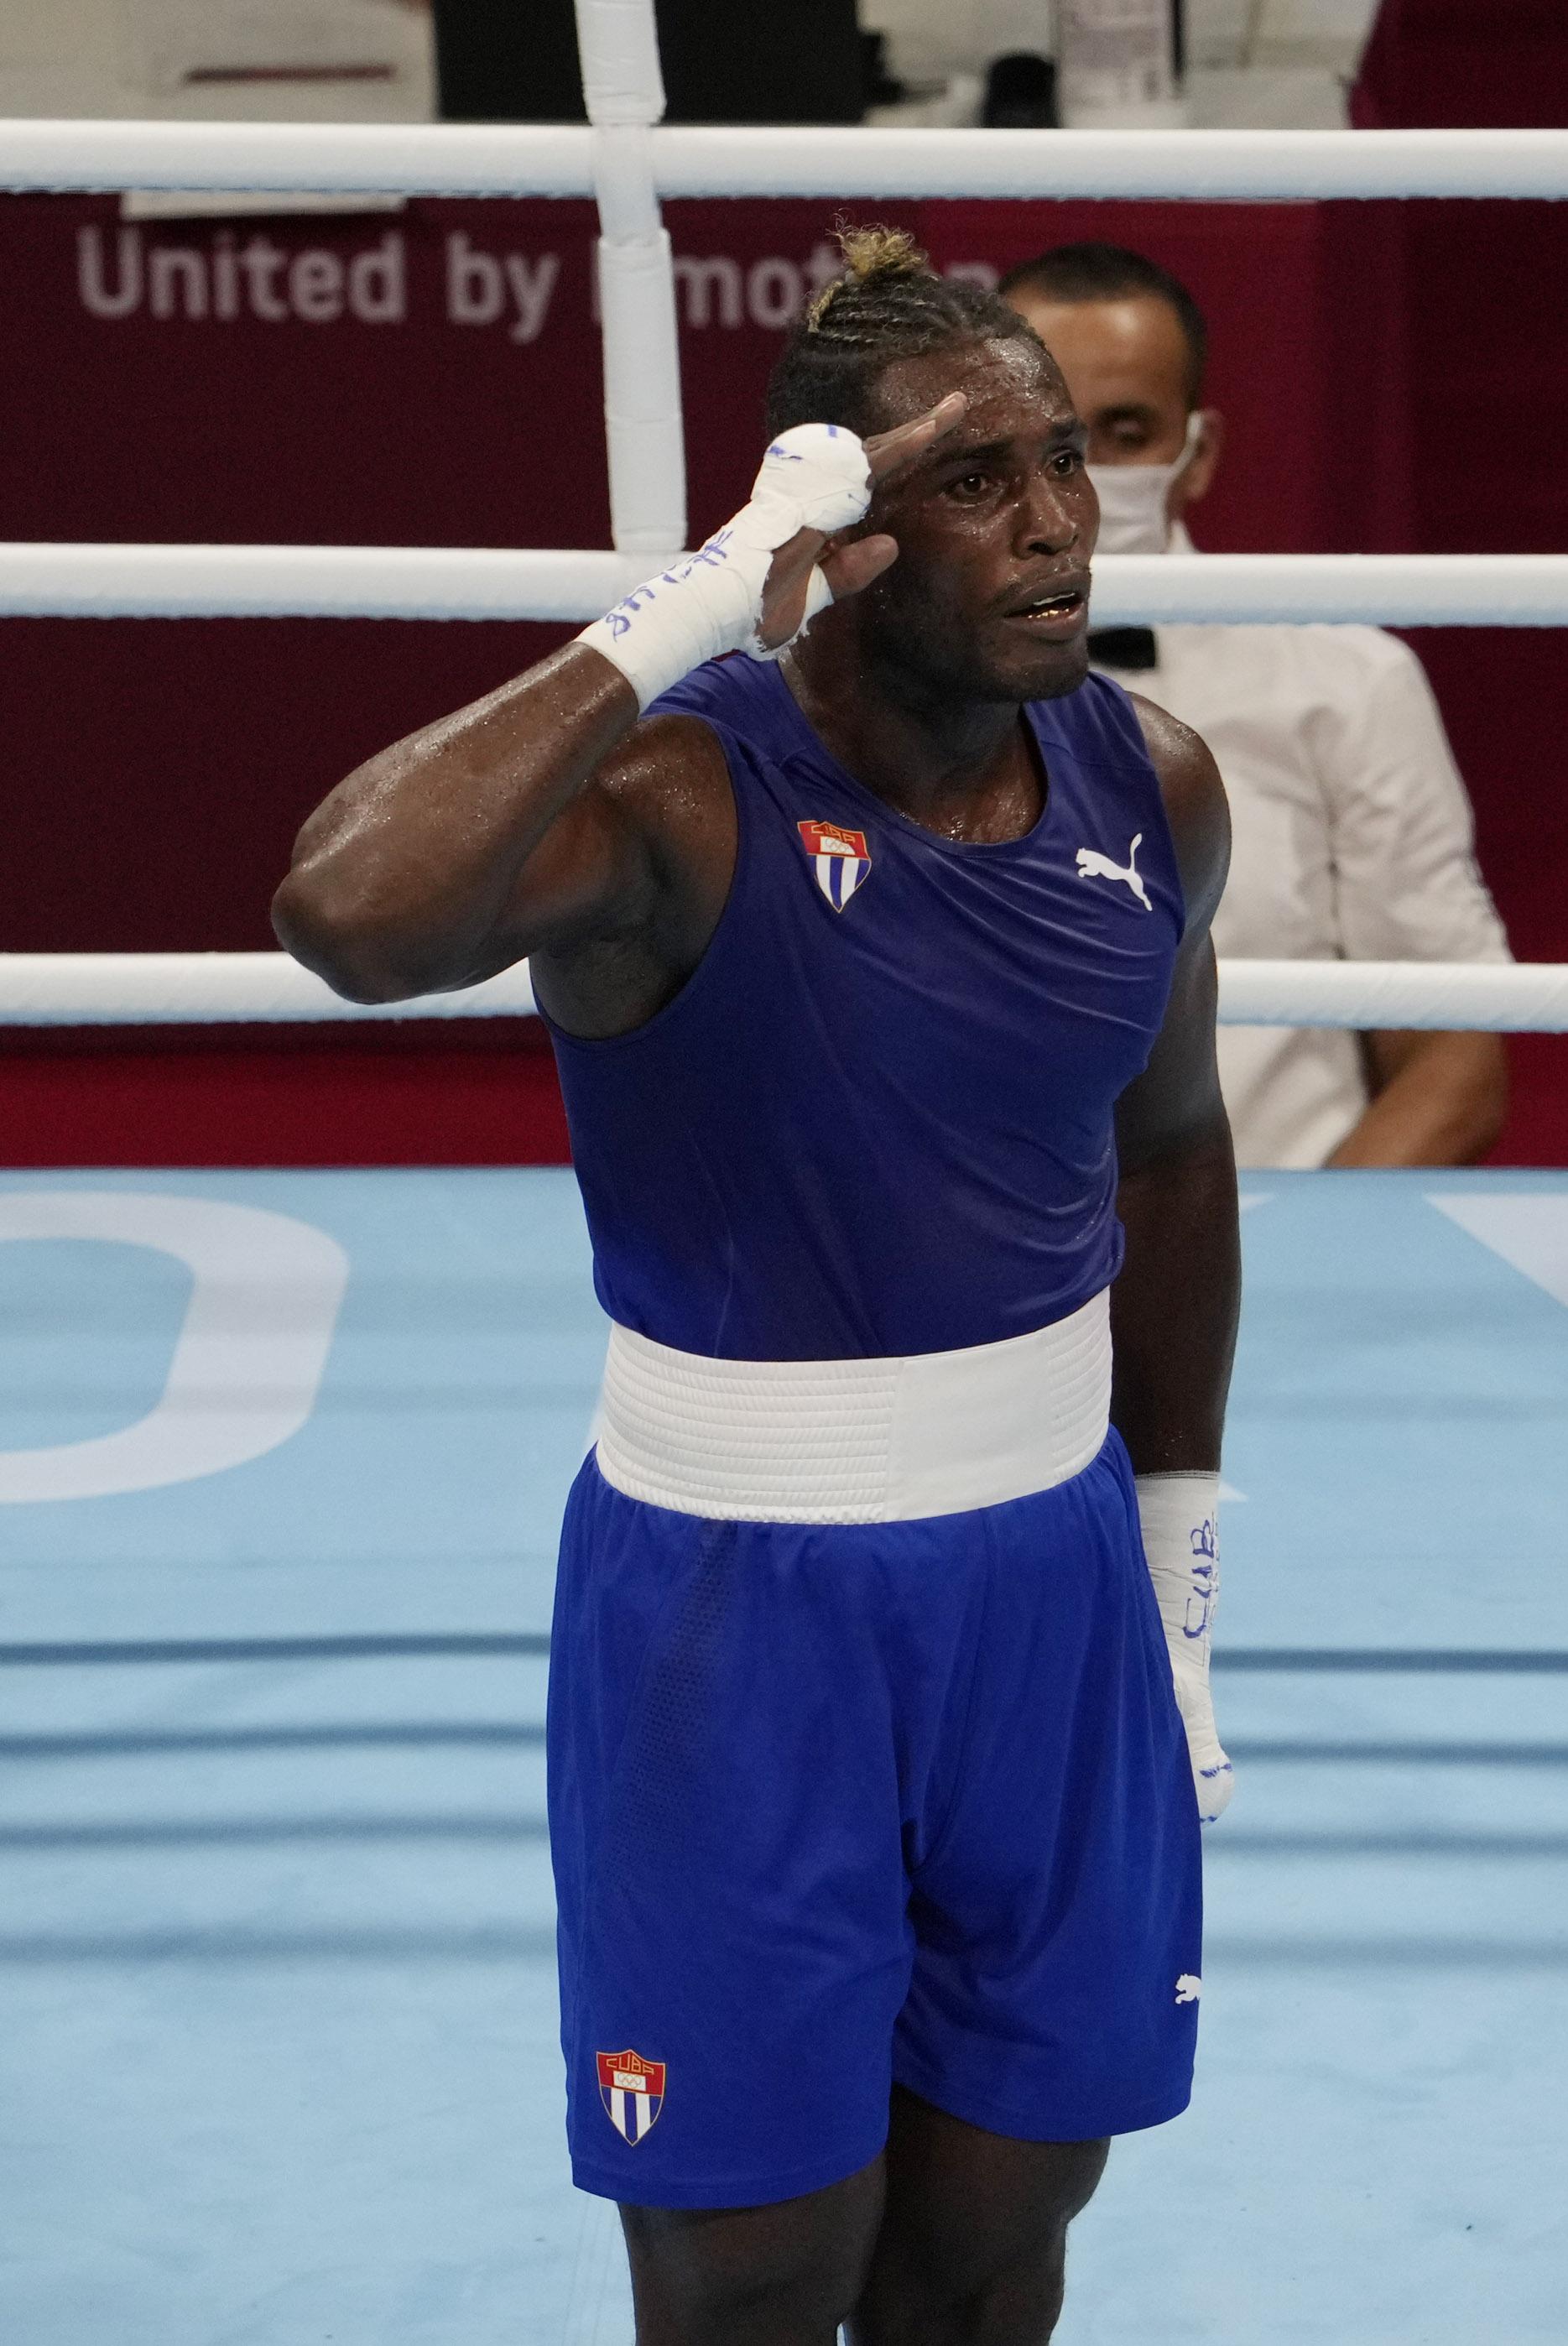 Julio la Cruz (CUB) defeats Abner Teixeira (BRA) in a men's heavy 81-91kg semifinal during the Tokyo 2020 Olympic Summer Games at Kokugikan Arena.